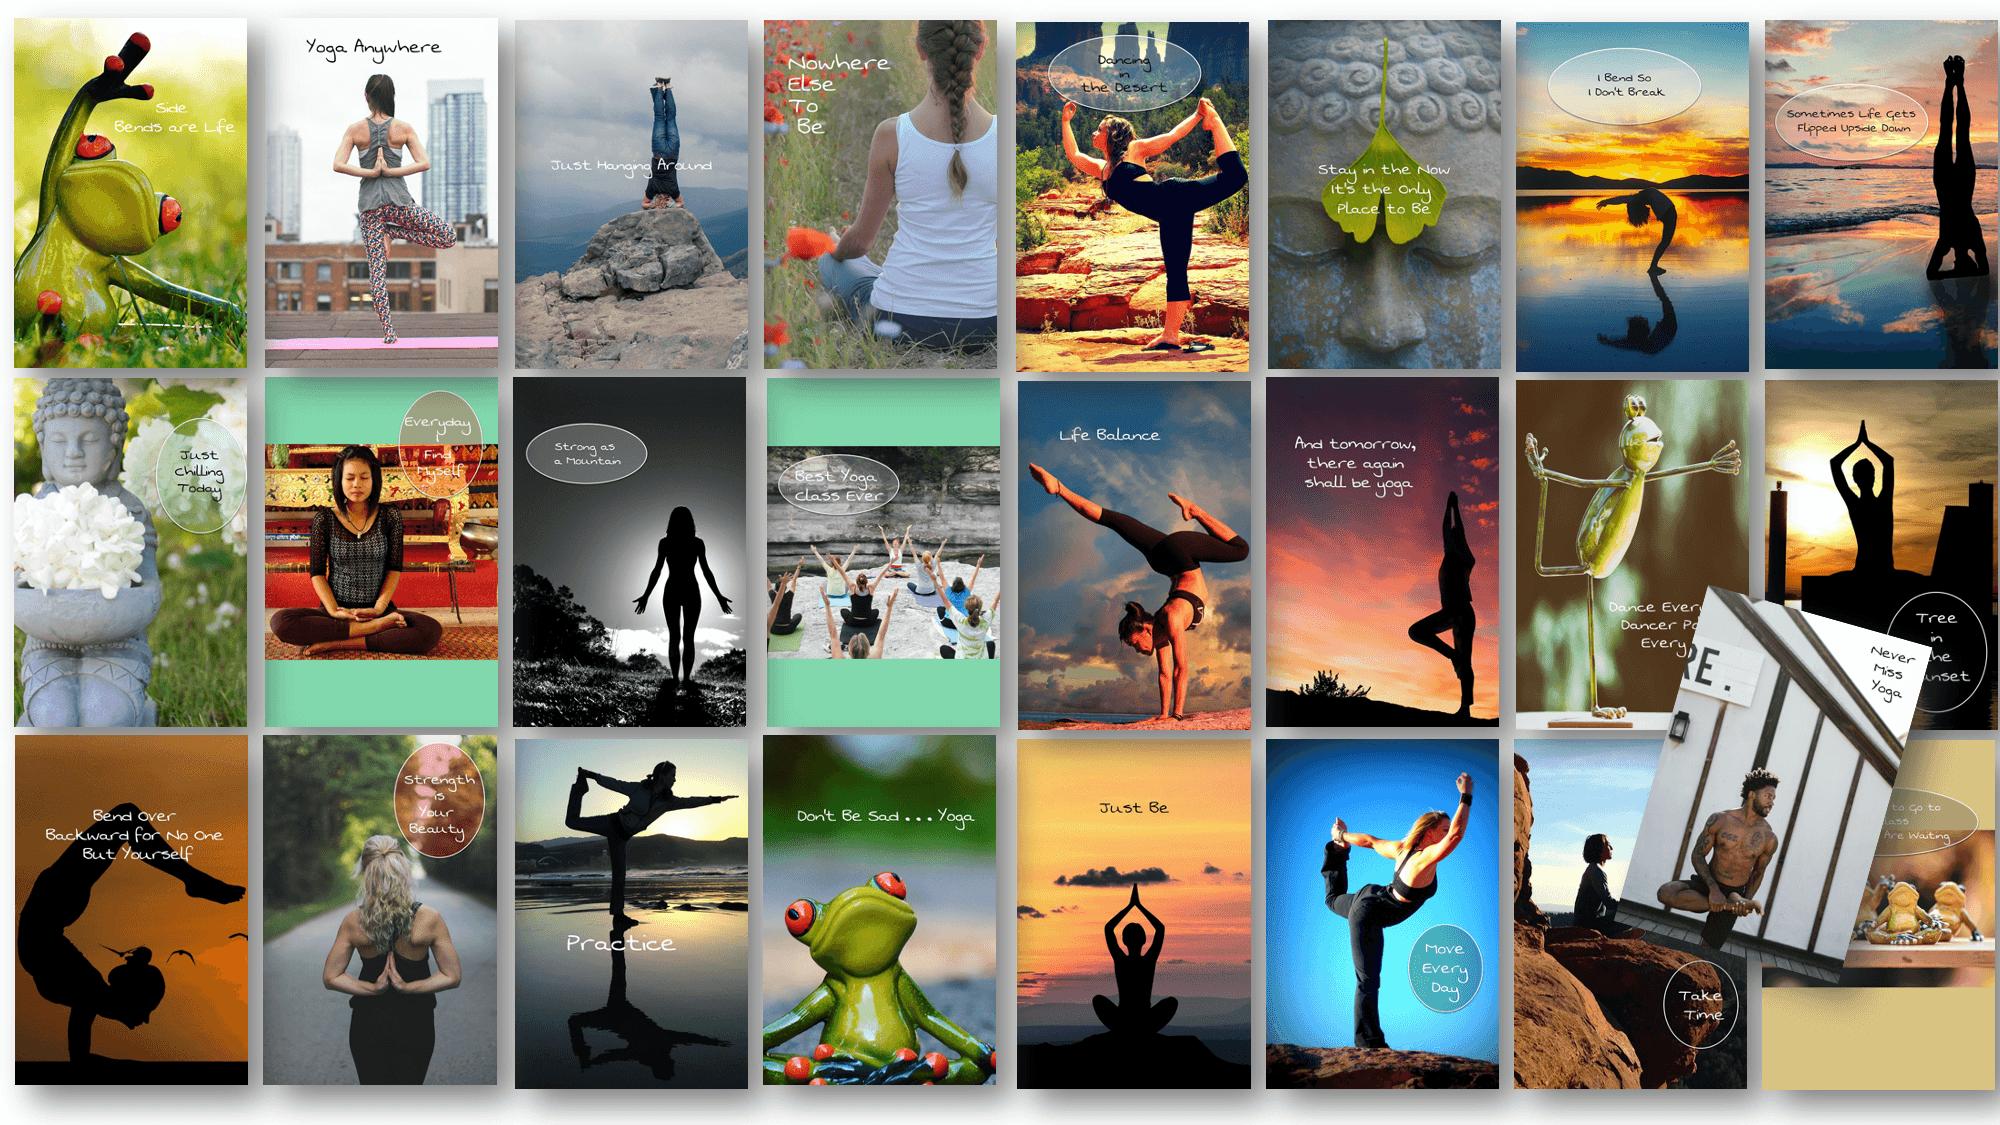 25 More Yoga Pinterest Pins